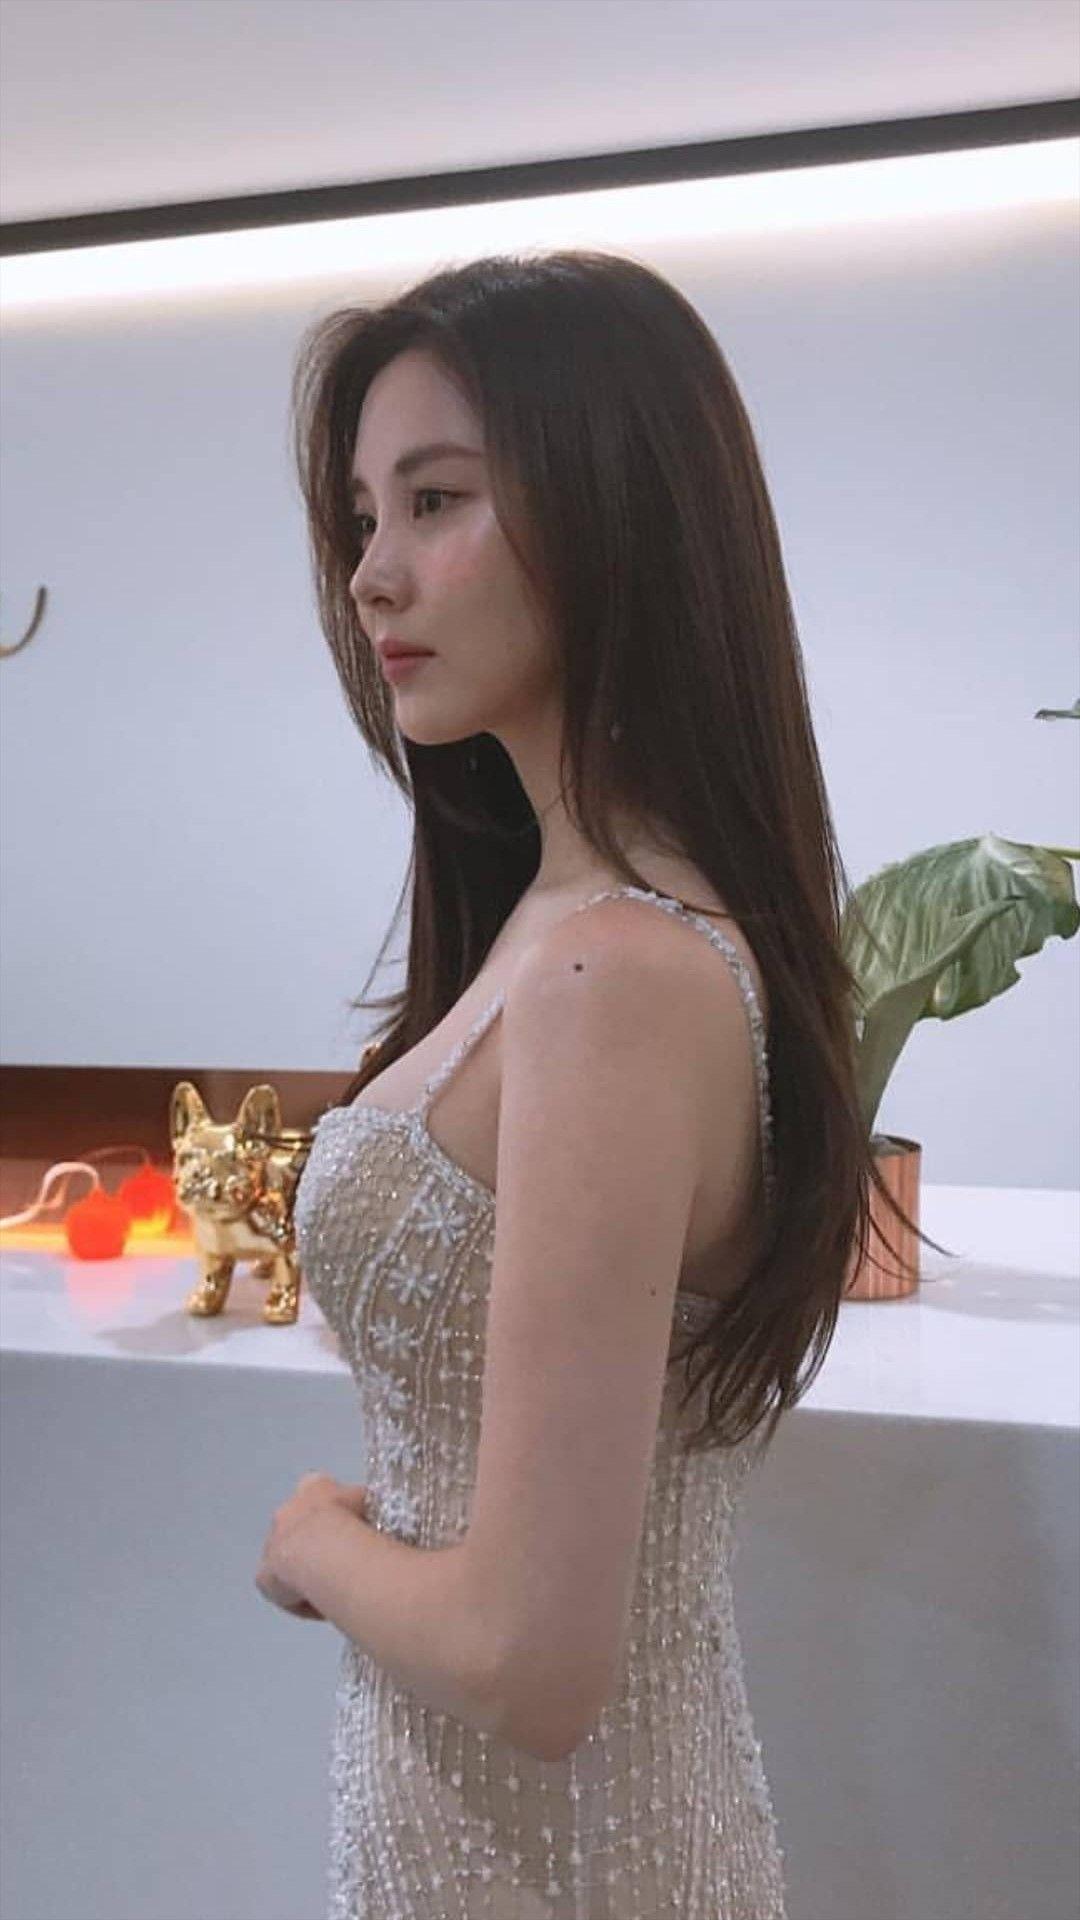 Pin by Kpop Kdrama on Korean Drama Lace weddings